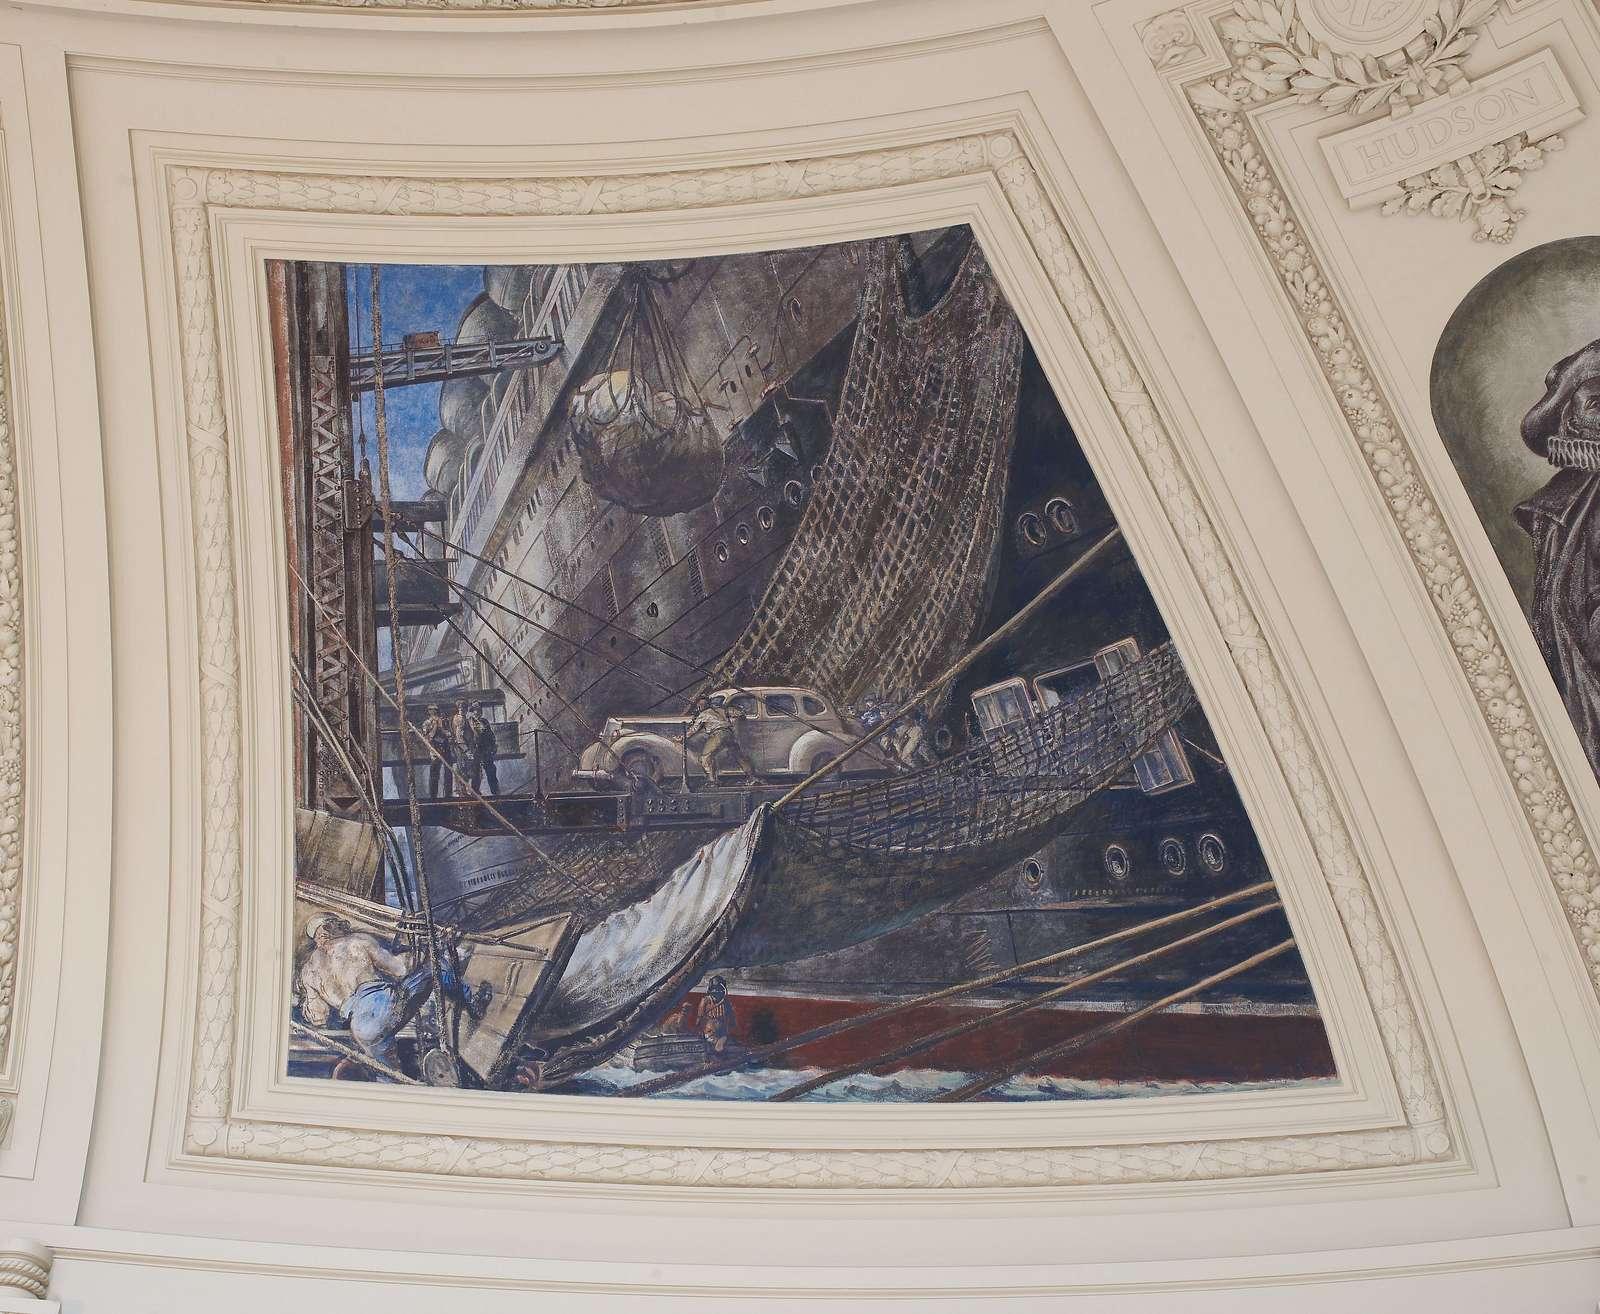 "Fresco painting ""Unloading Cargo"" located in rotunda of Alexander Hamilton U.S. Custom House, New York, New York"